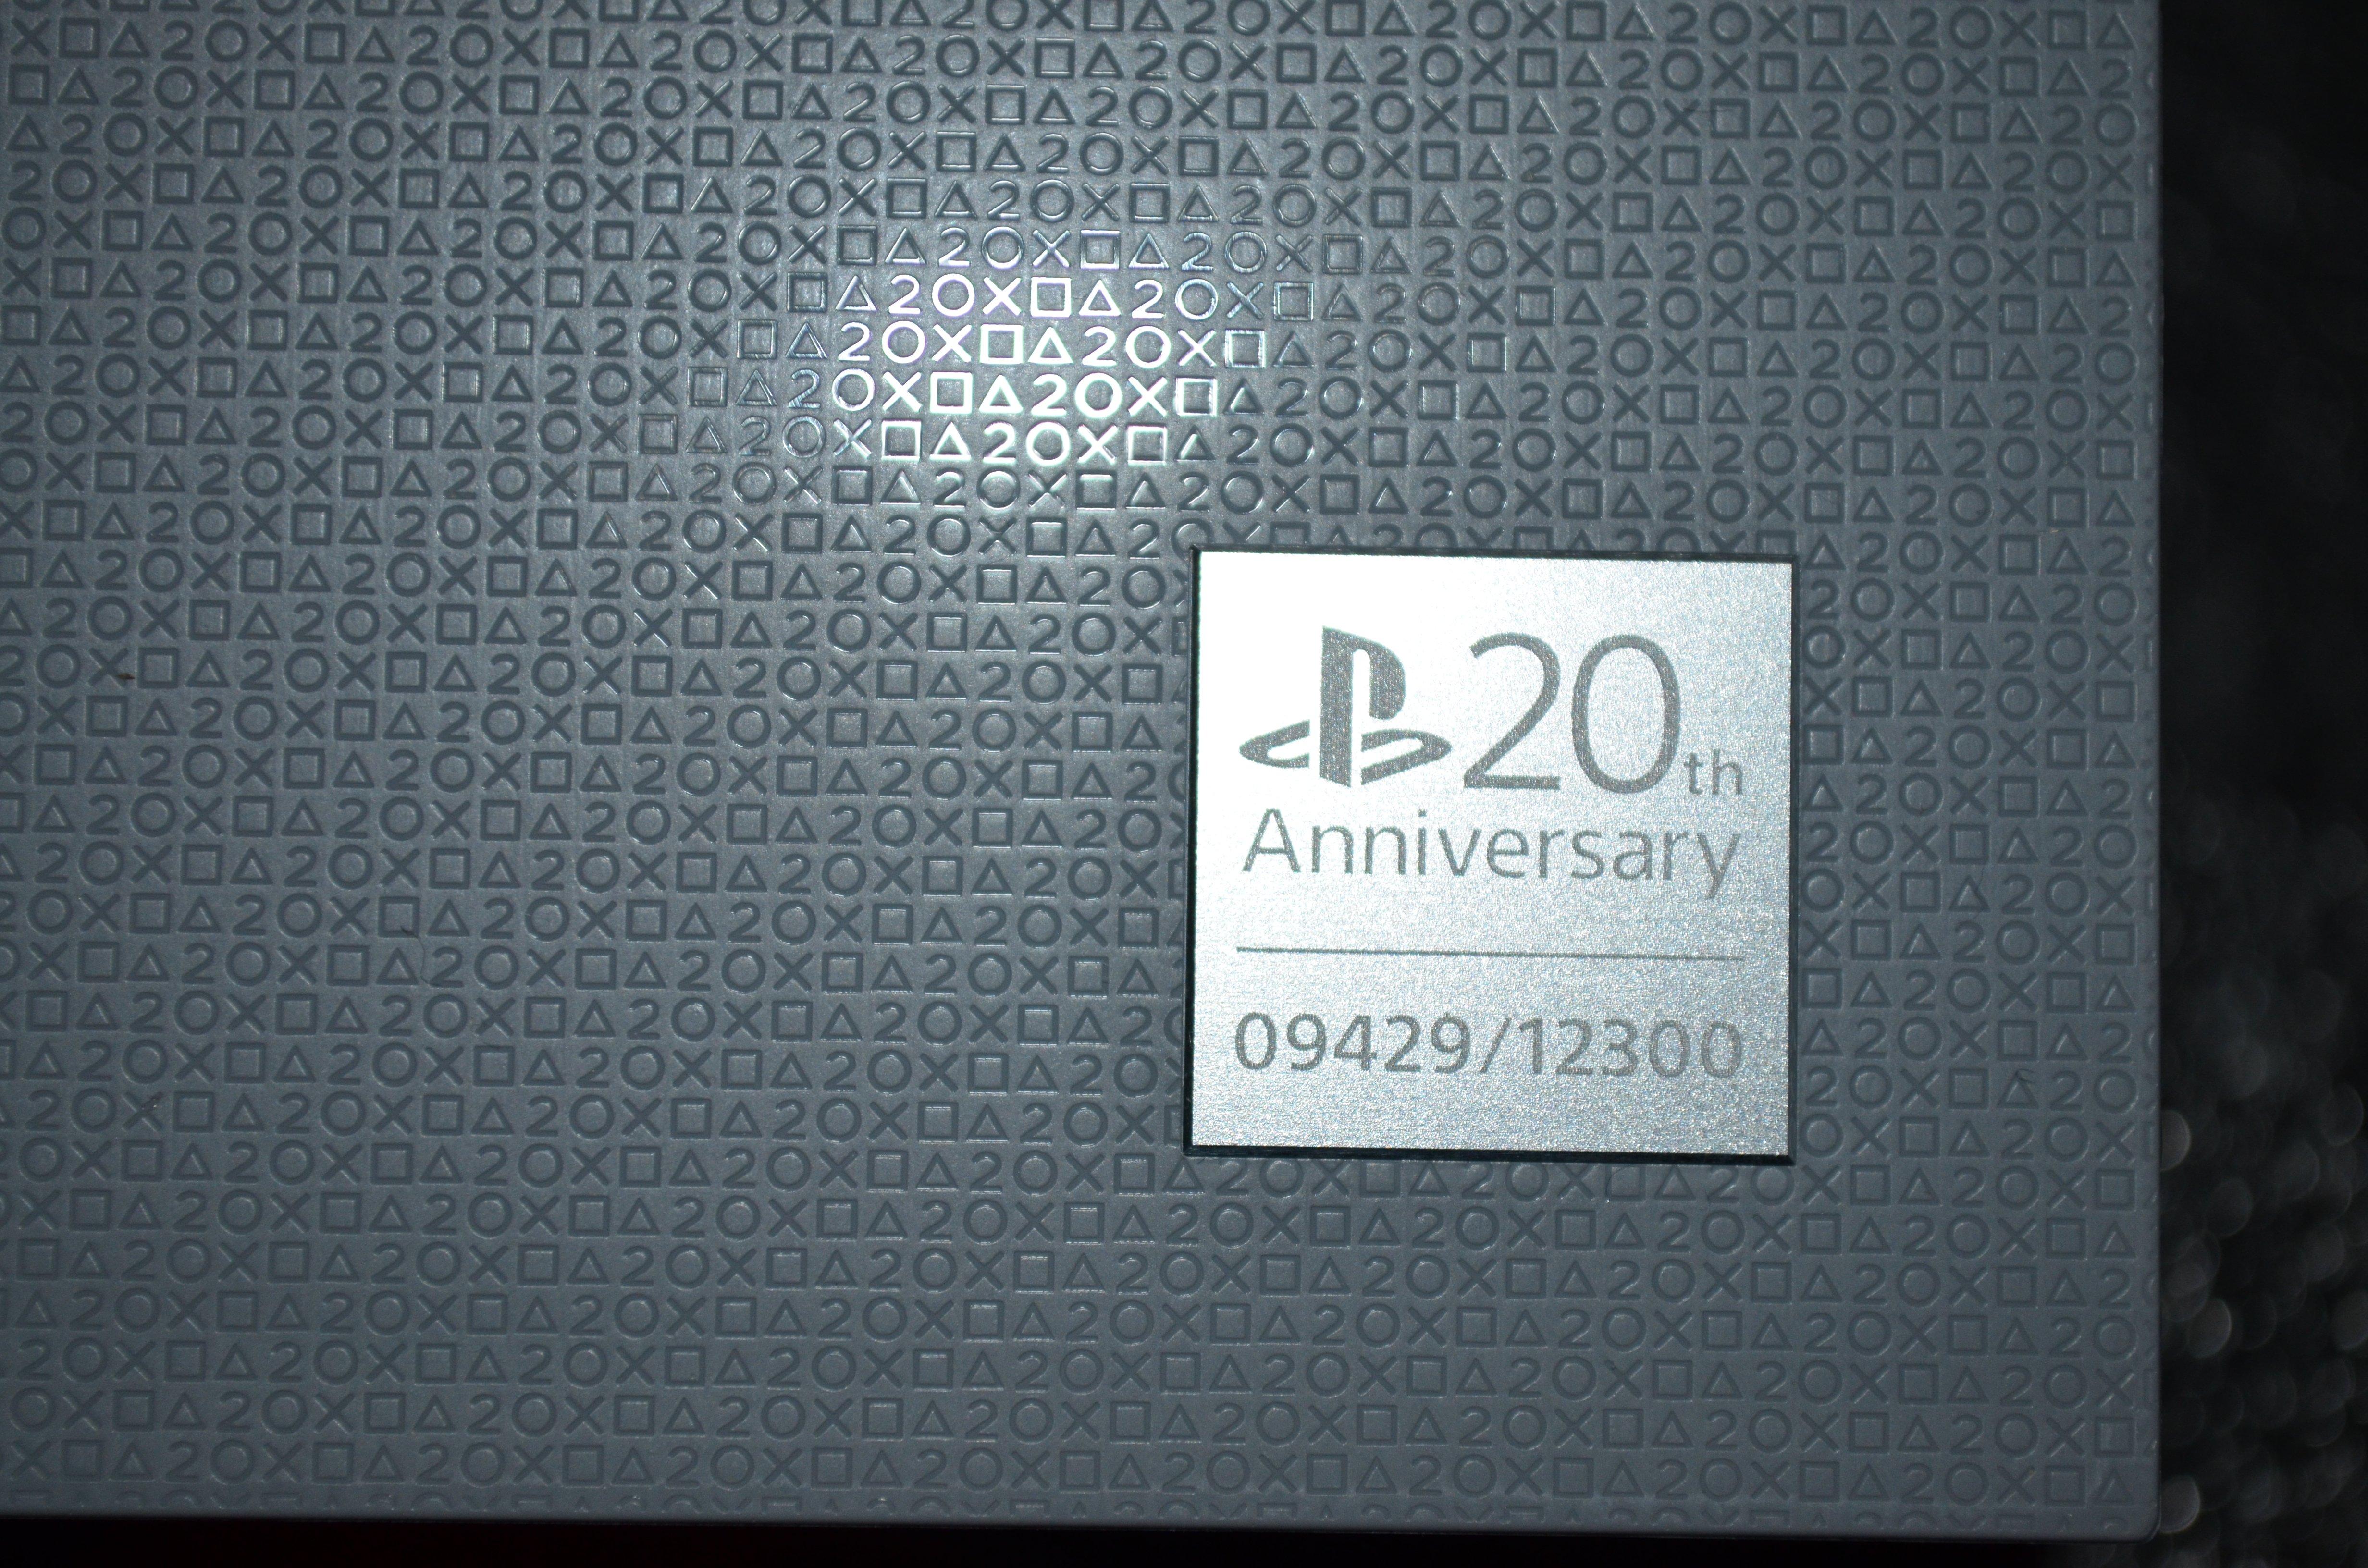 Анбоксинг Имперского издания Playstation 4 Anniversary Edition - Изображение 21